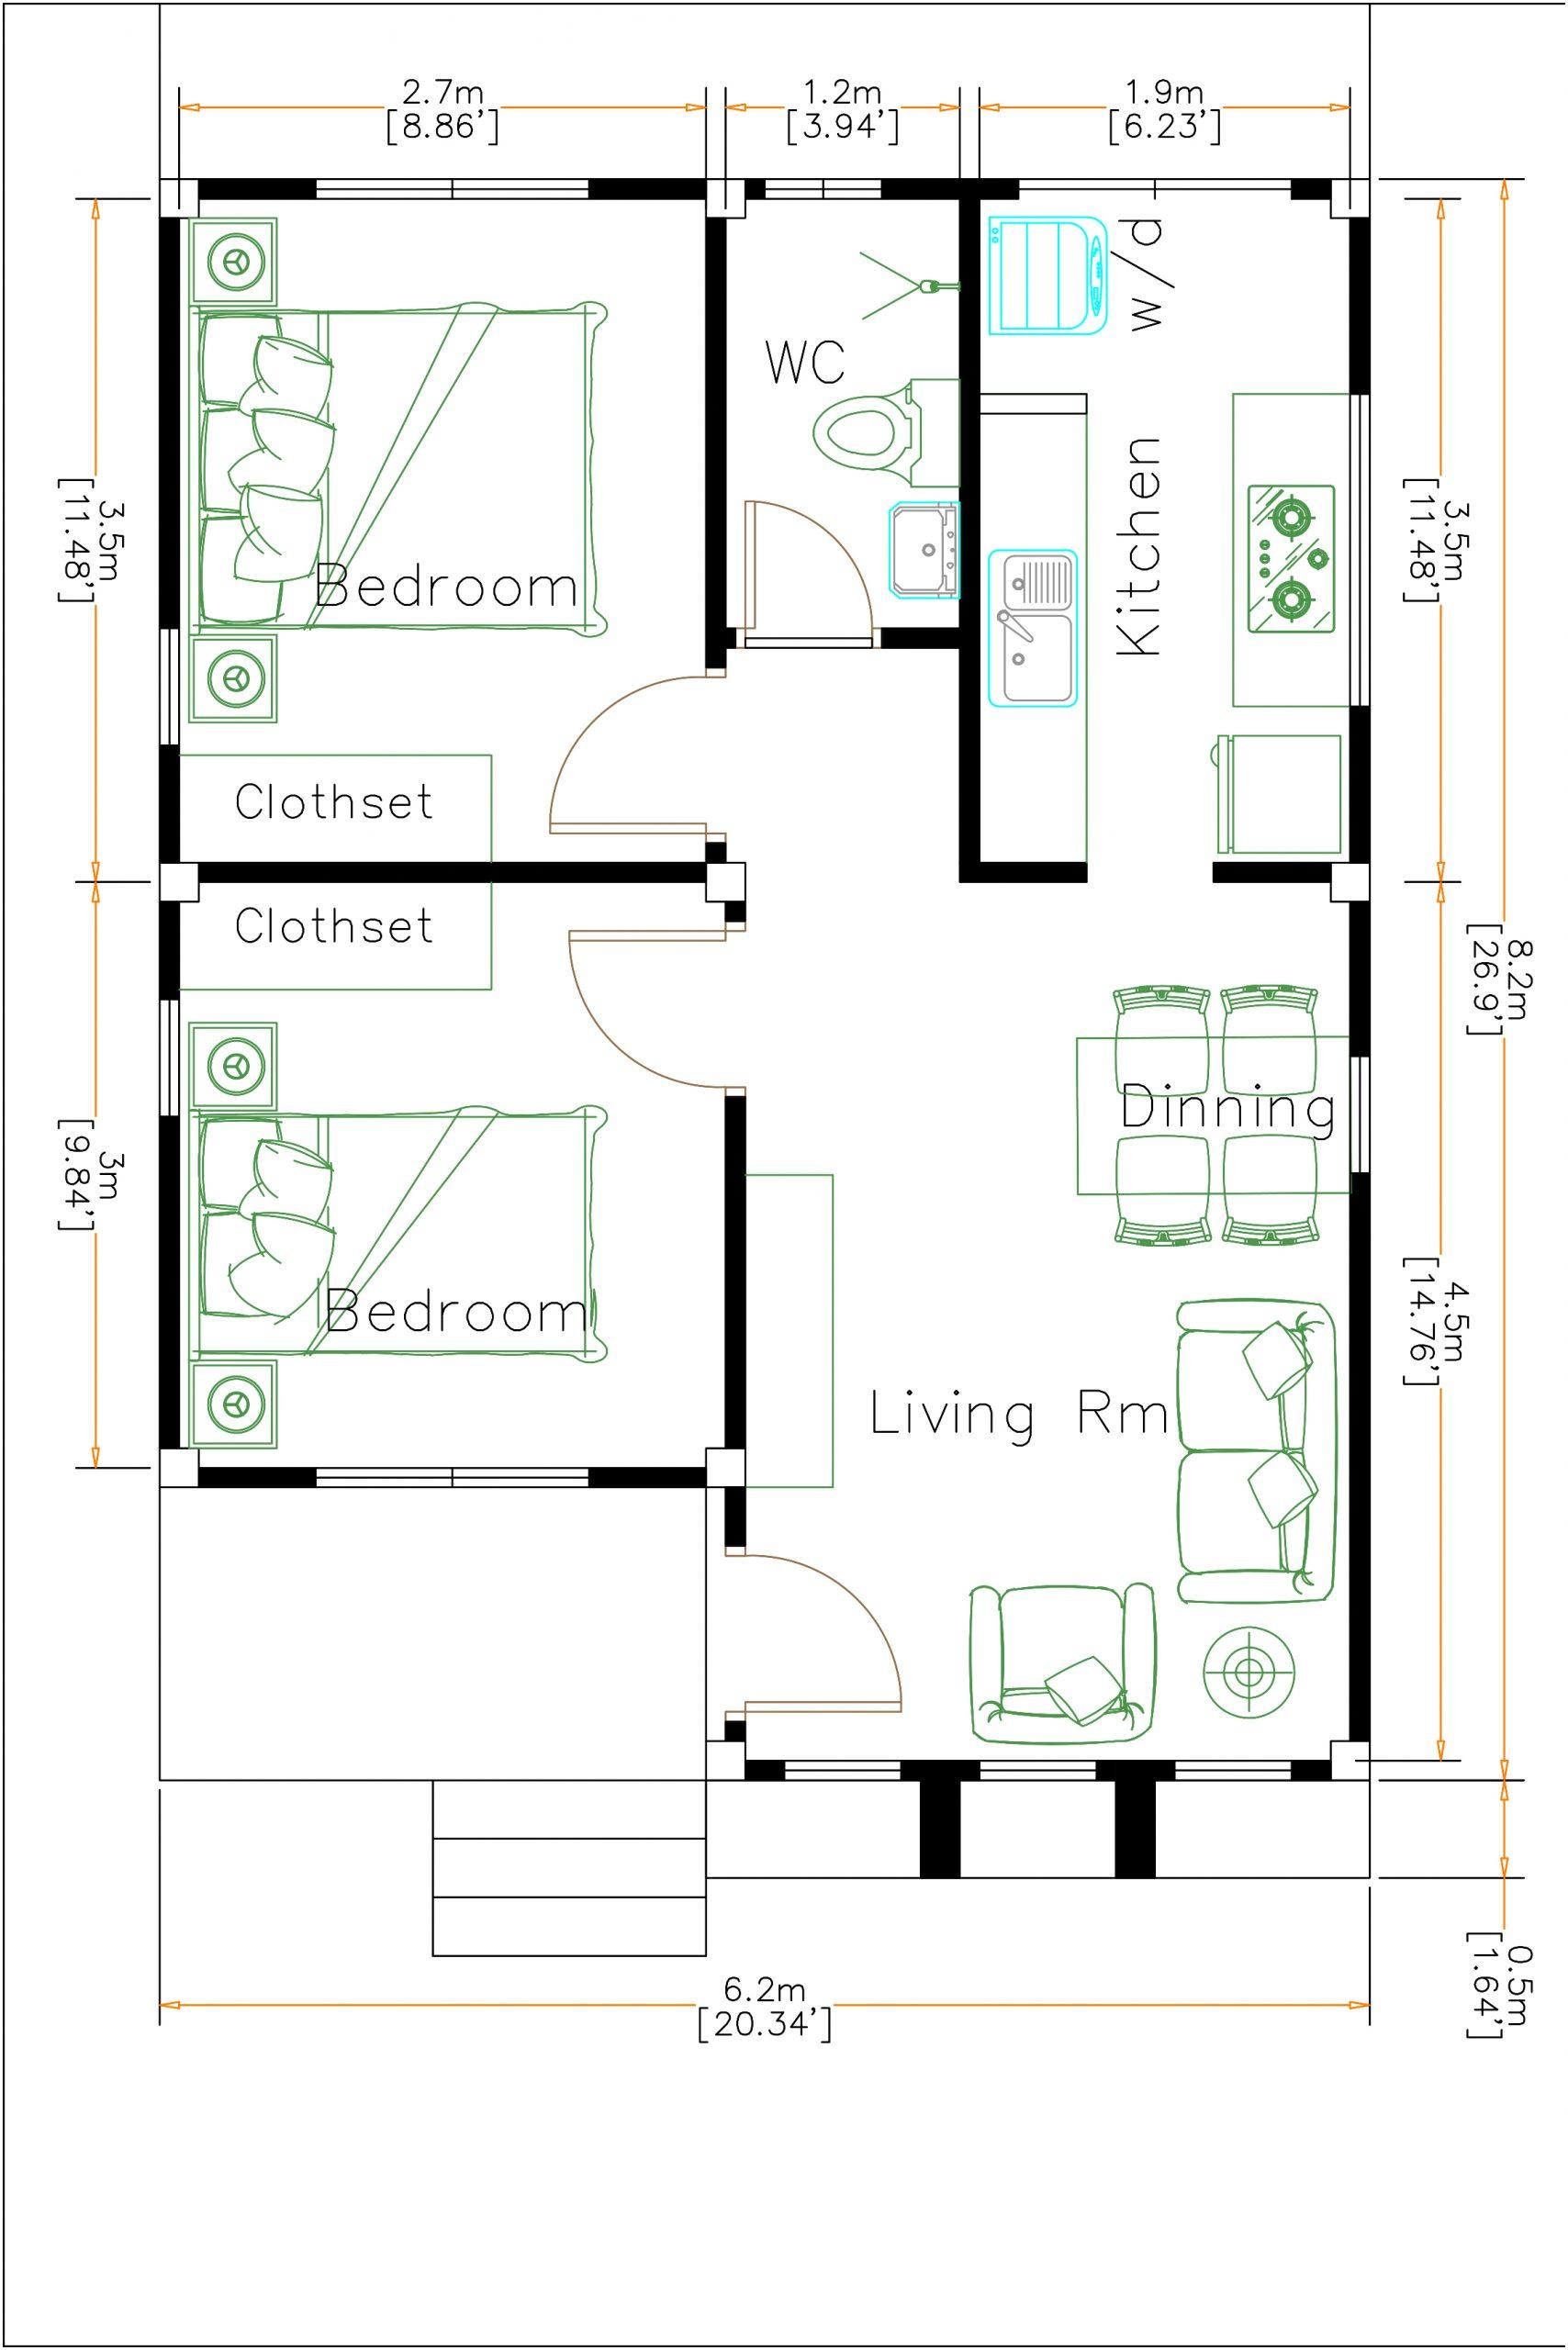 White House Floor Plan 6x8 Meter 20x27 Feet 2 Beds Layout Floor Plan